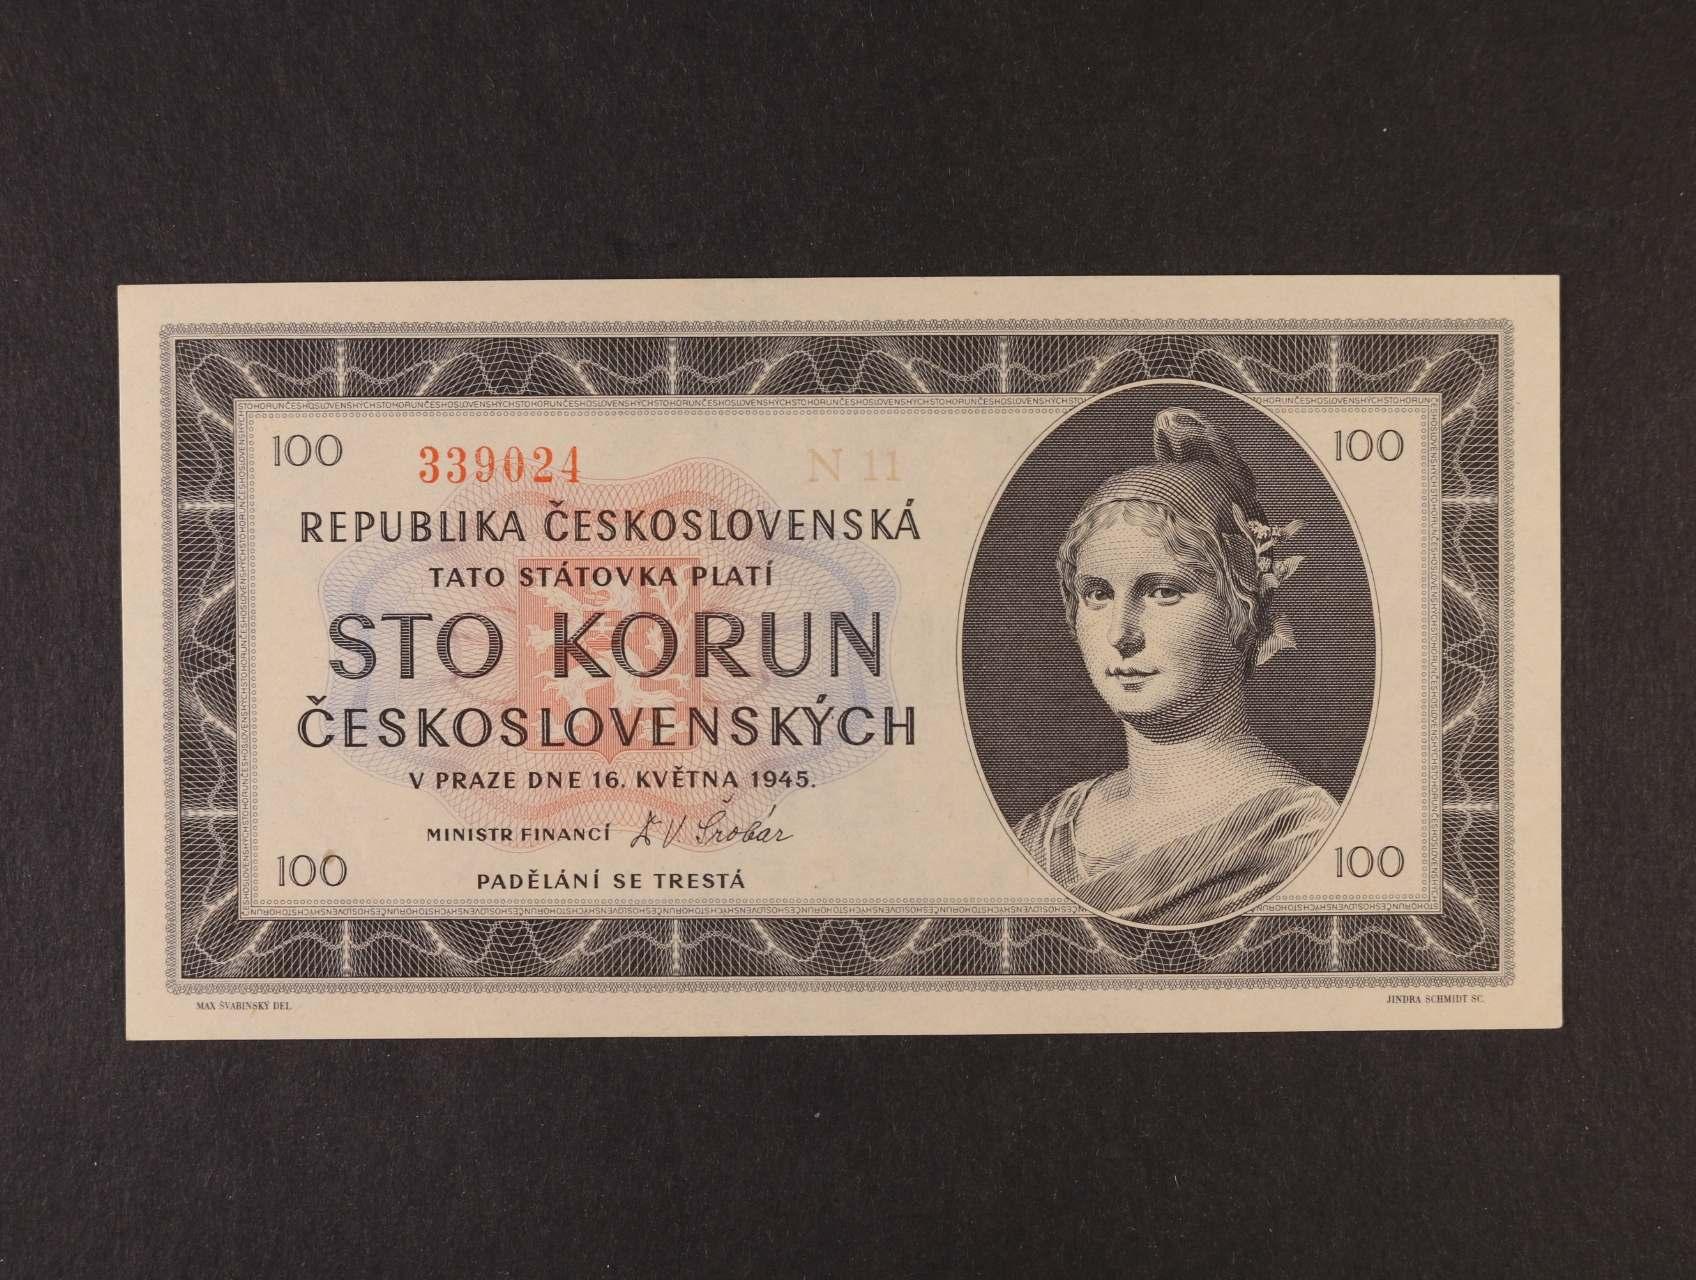 100 Kčs 16.5.1945 série N 11, Ba. 77c, Pi. 67a